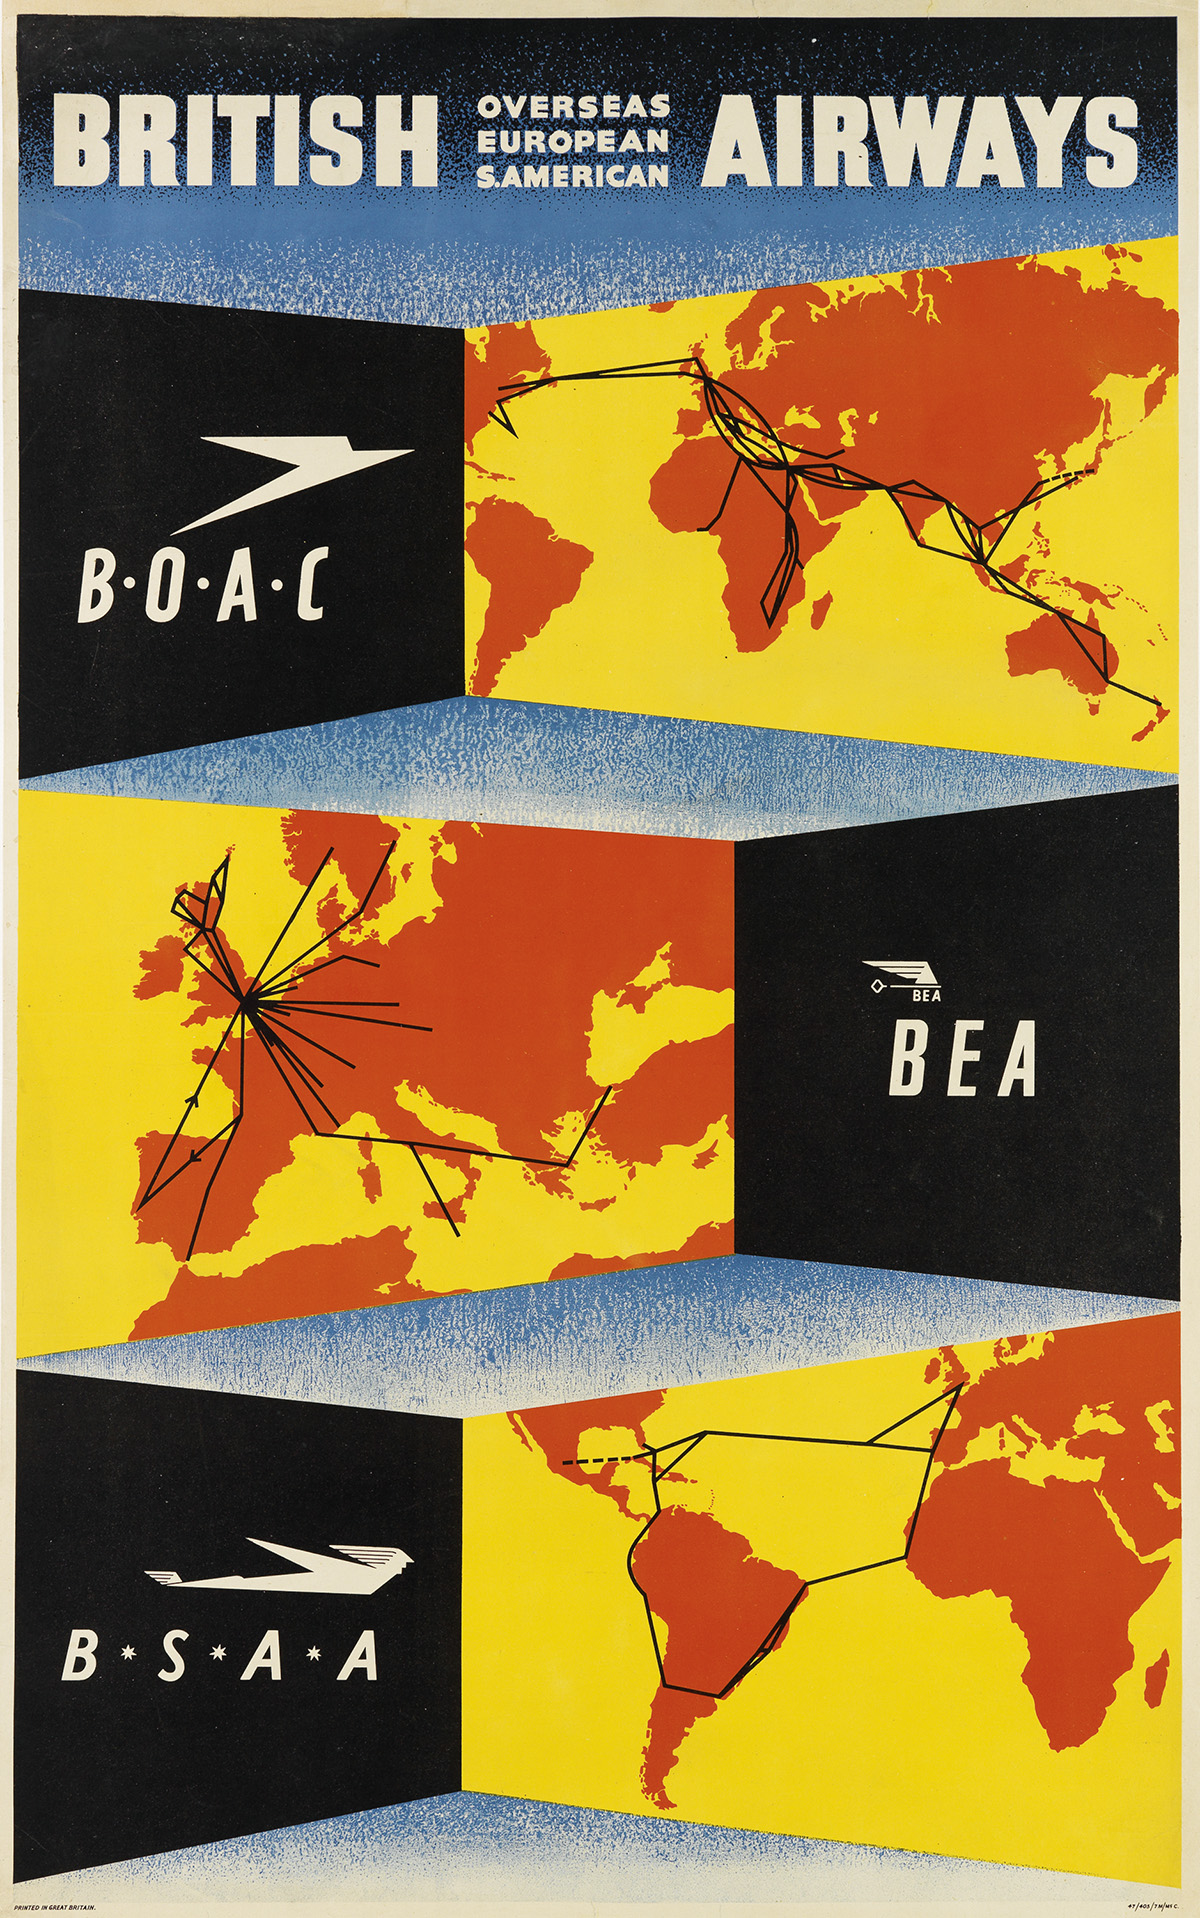 DESIGNER-UNKNOWN-BRITISH-AIRWAYS--B•O•A•C-BEA-B•S•A•A-1947-4